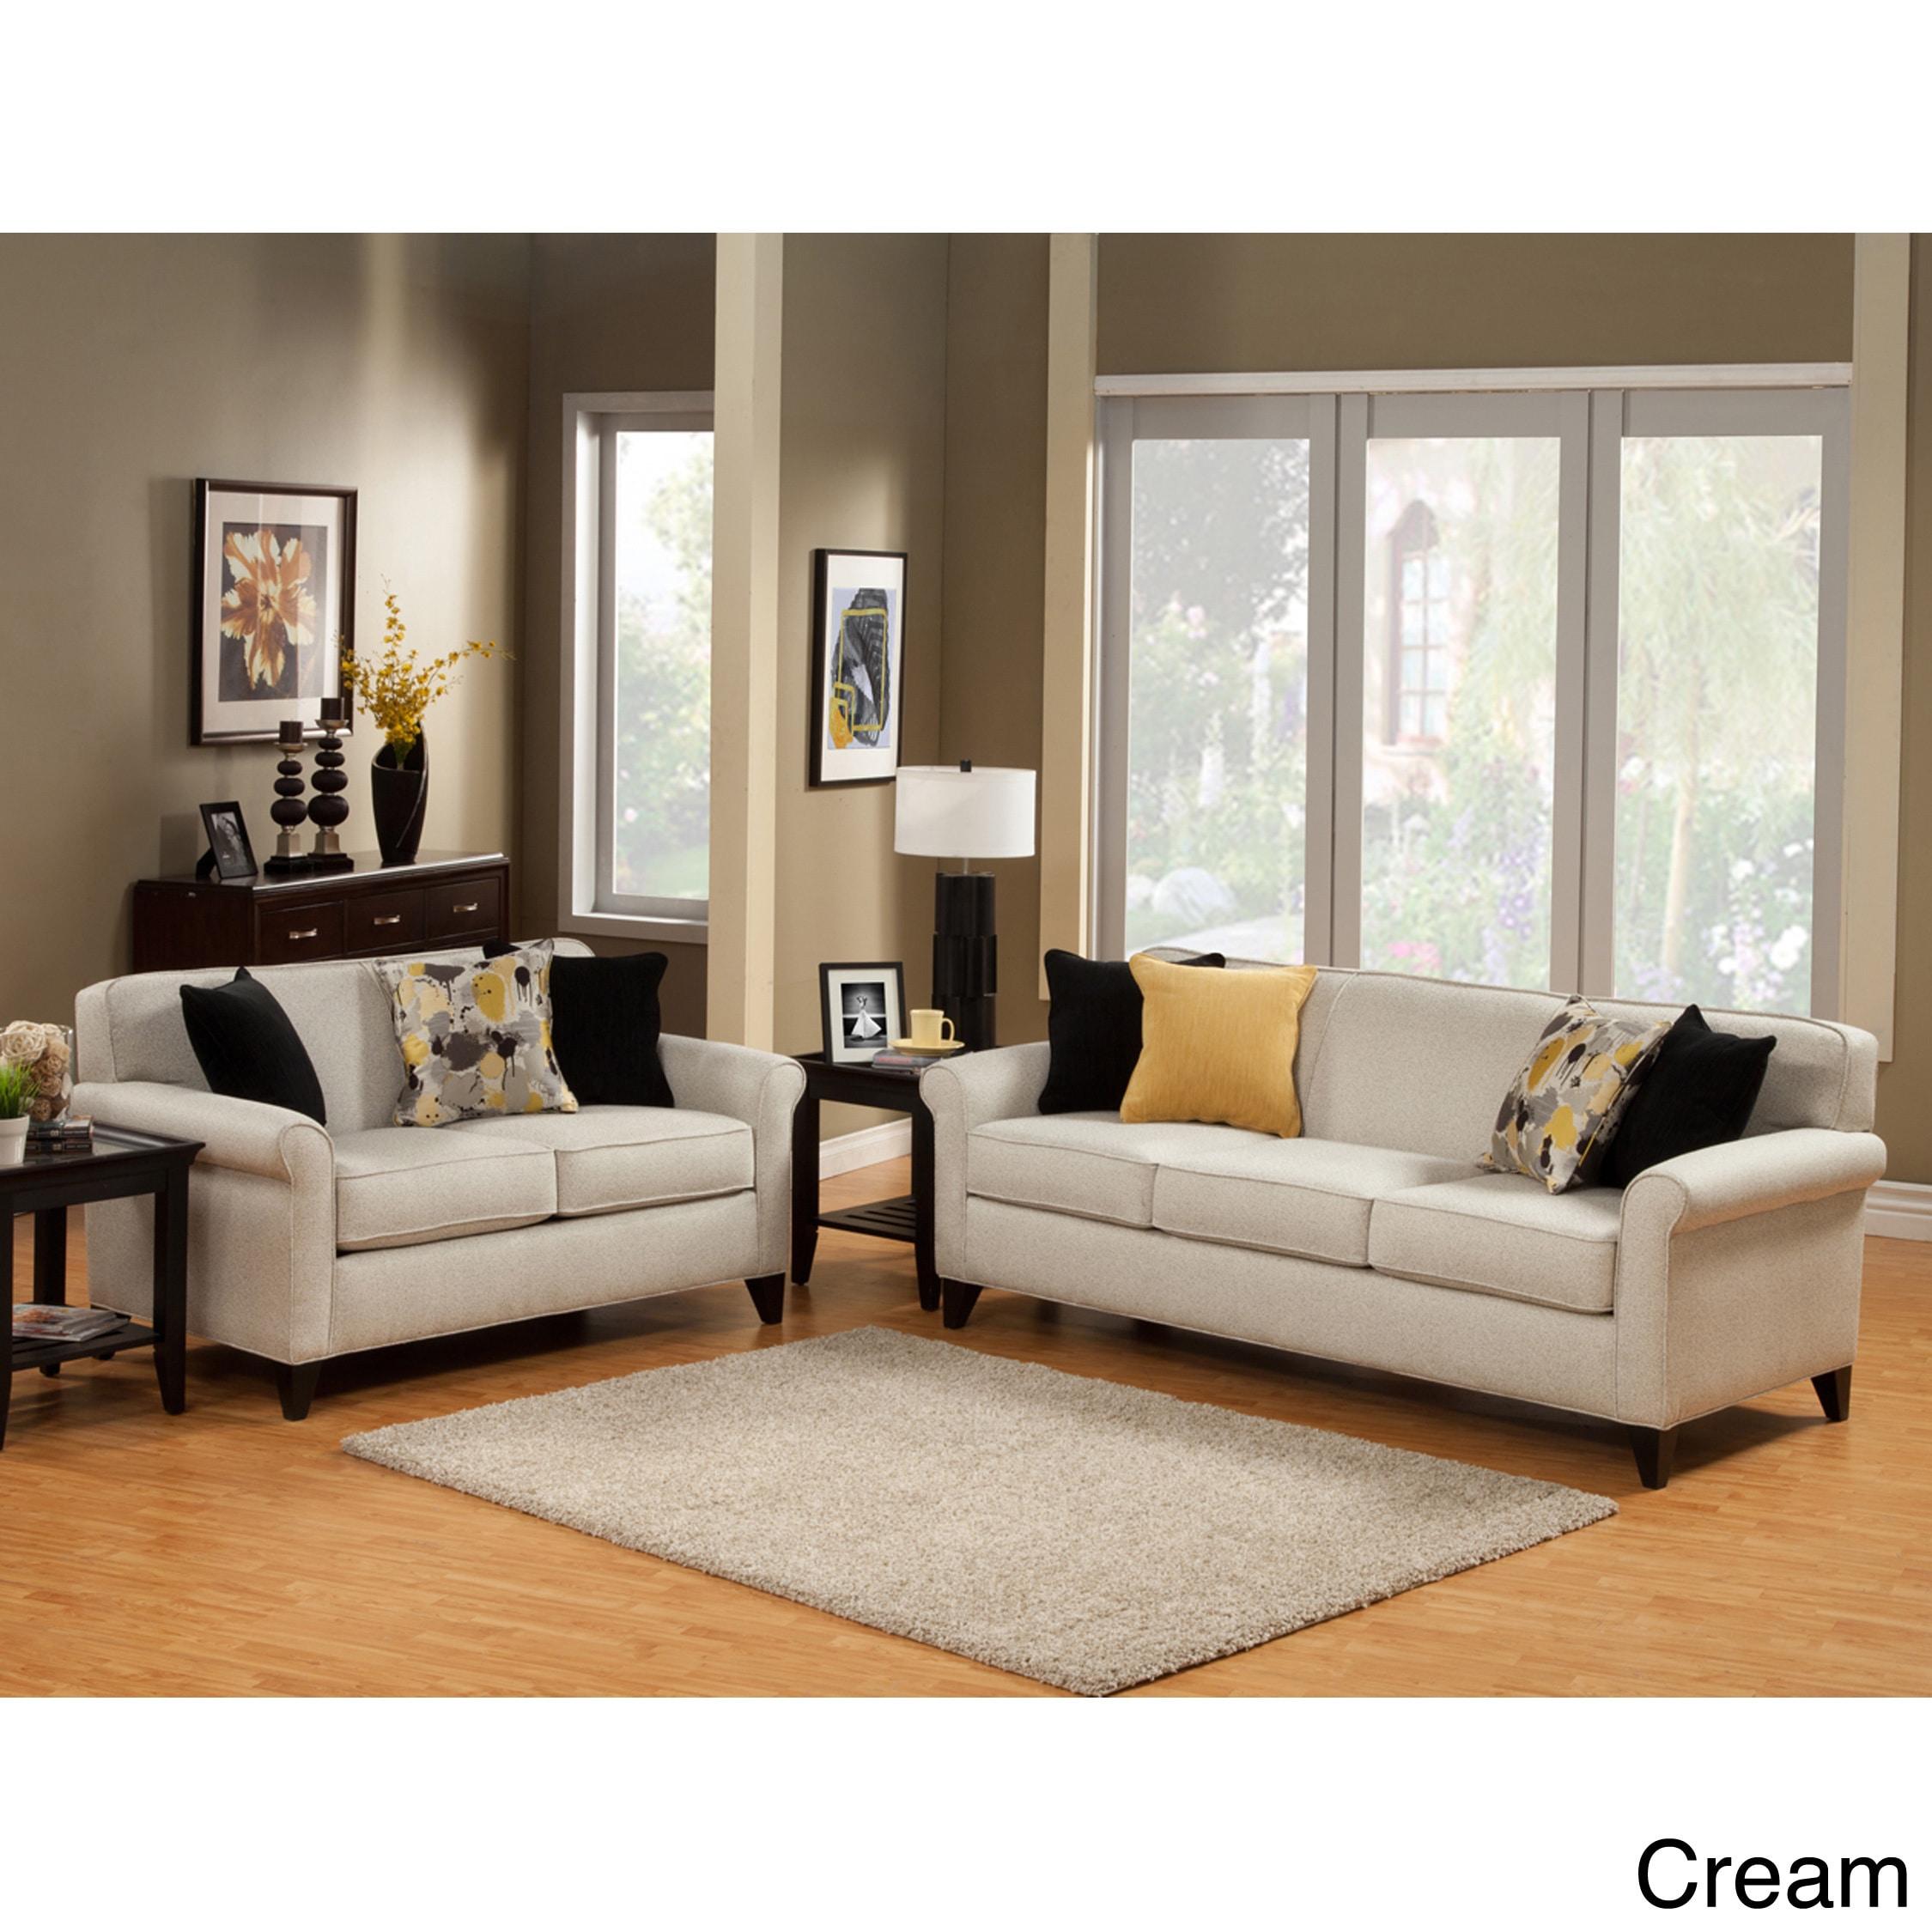 Furniture of America Artistica Sleek Modern 2 Piece